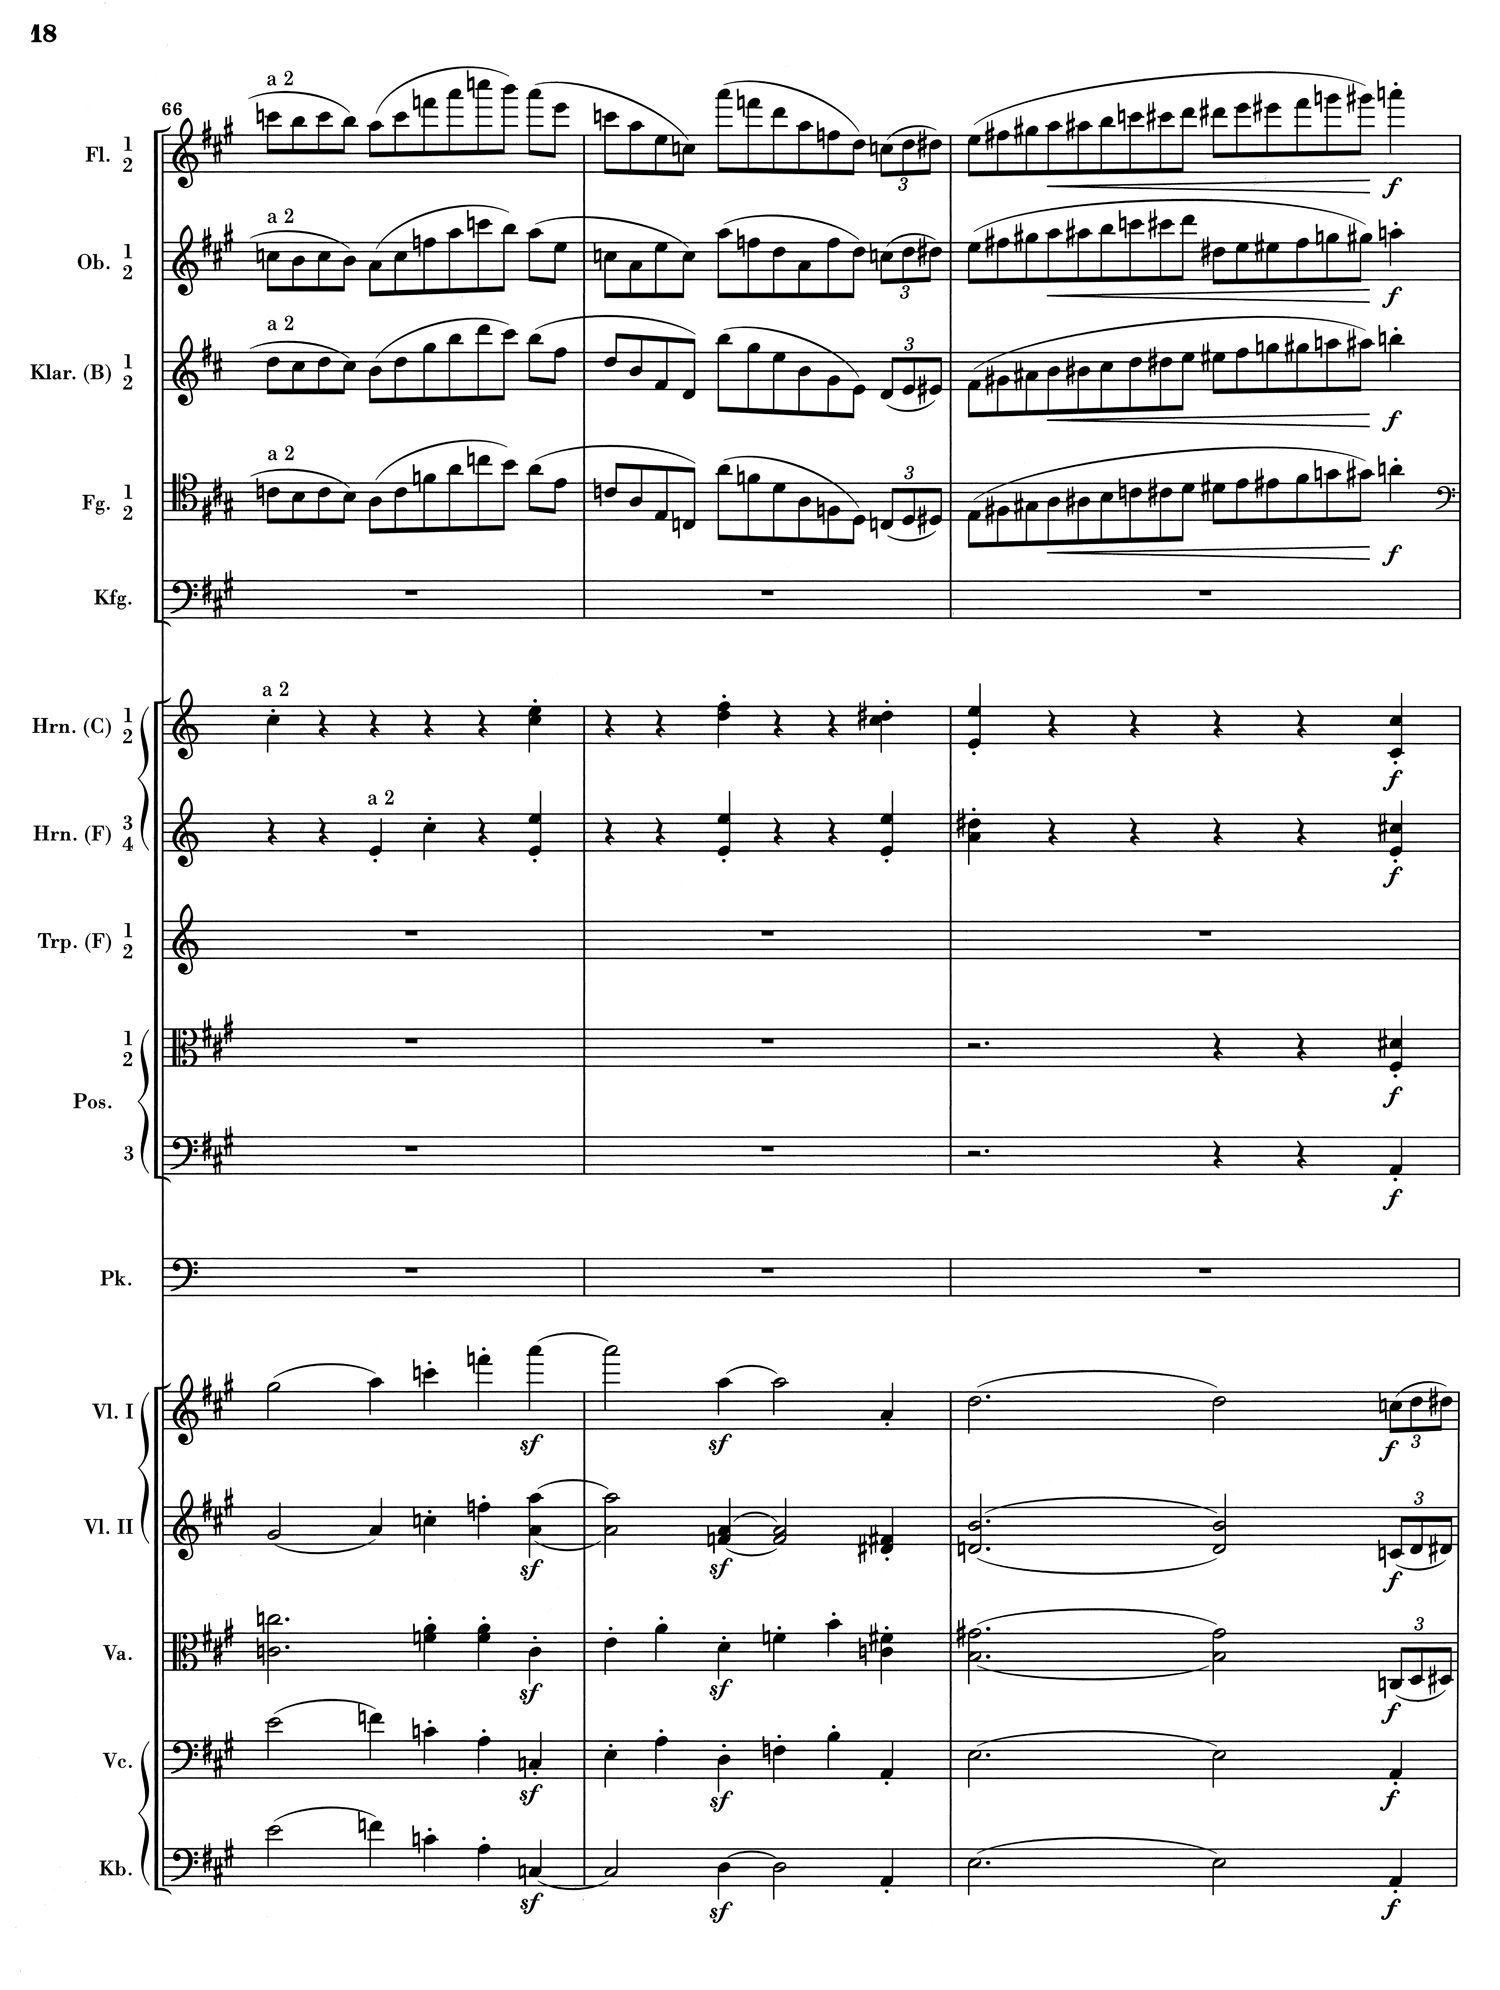 Brahms 3 Score 3.jpg